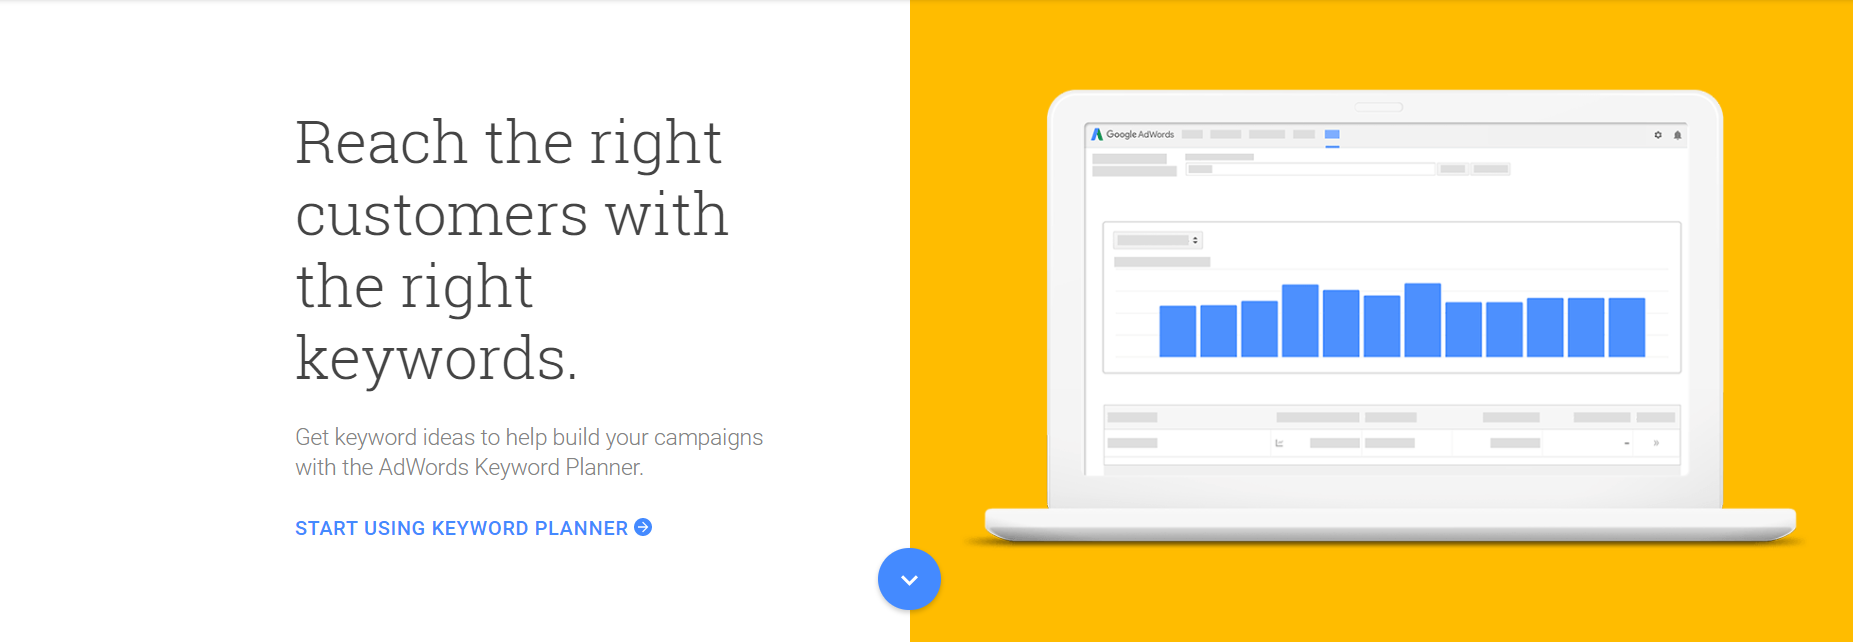 Google Keyword Planner- WordPress SEO Tools for dropshippers